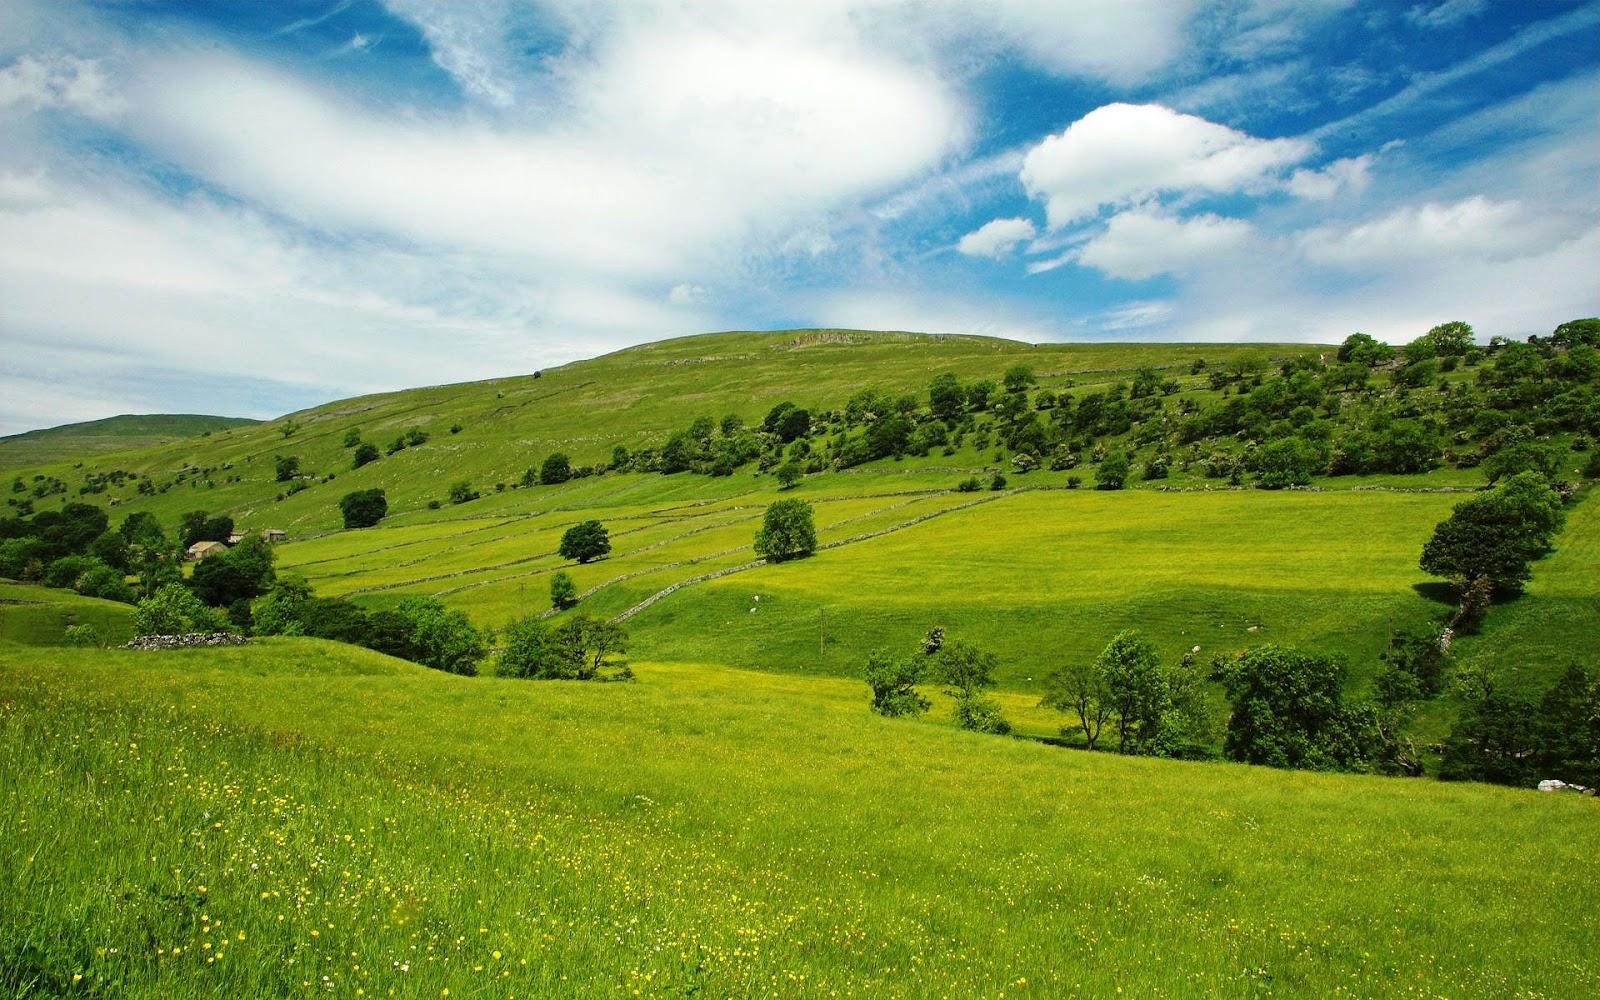 beautiful wallpapers: clouds blue sky green grass hills nature